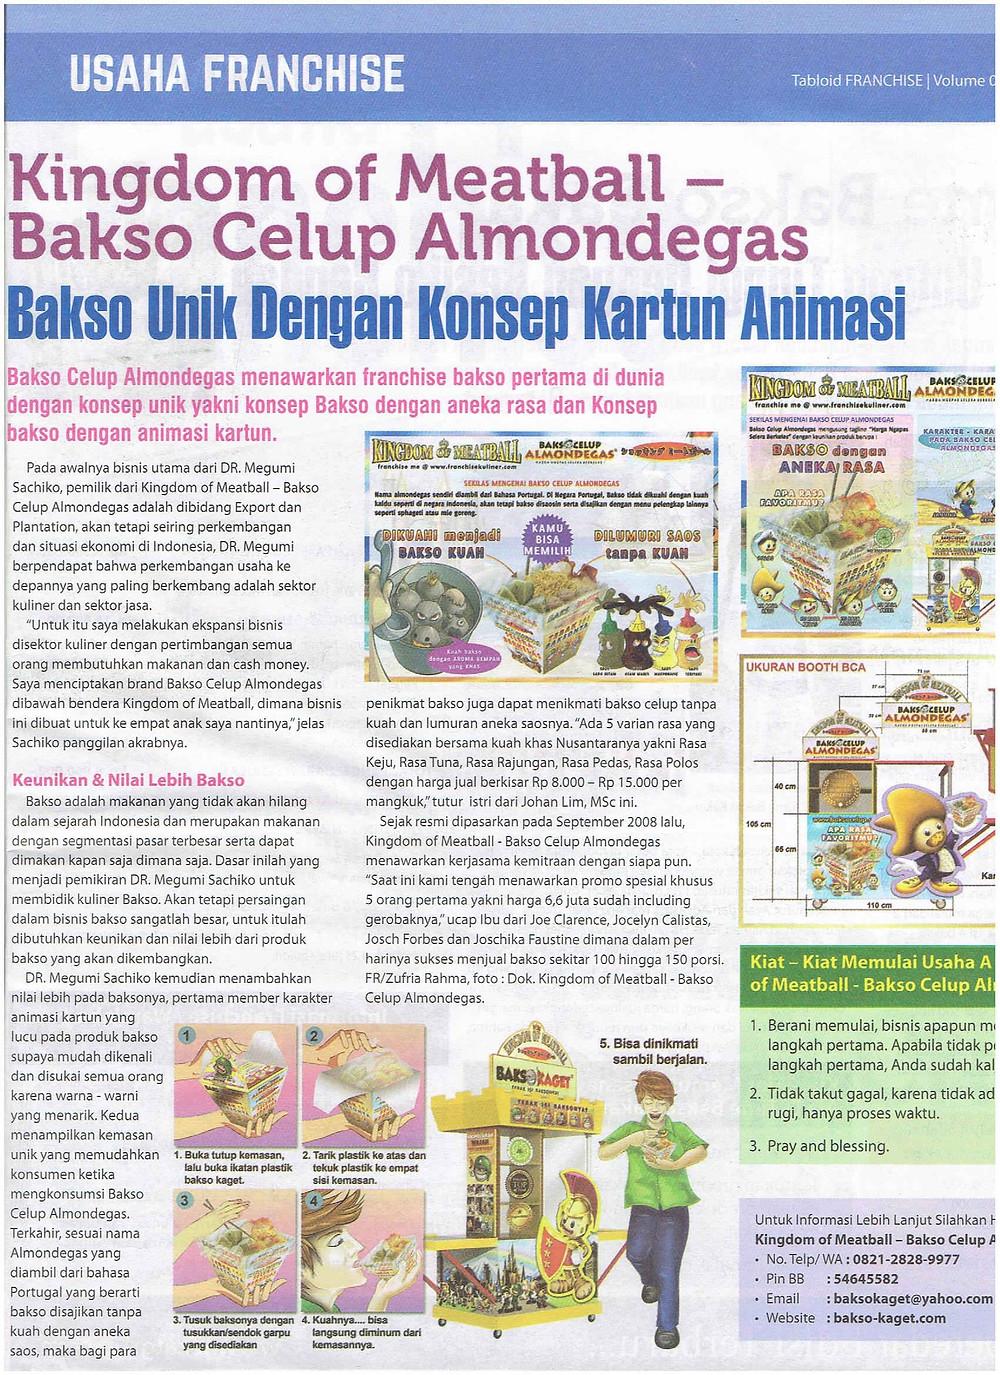 Liputan Peluang Bisnis Bakso Celup - Tabloid Franchise Edisi April 2016